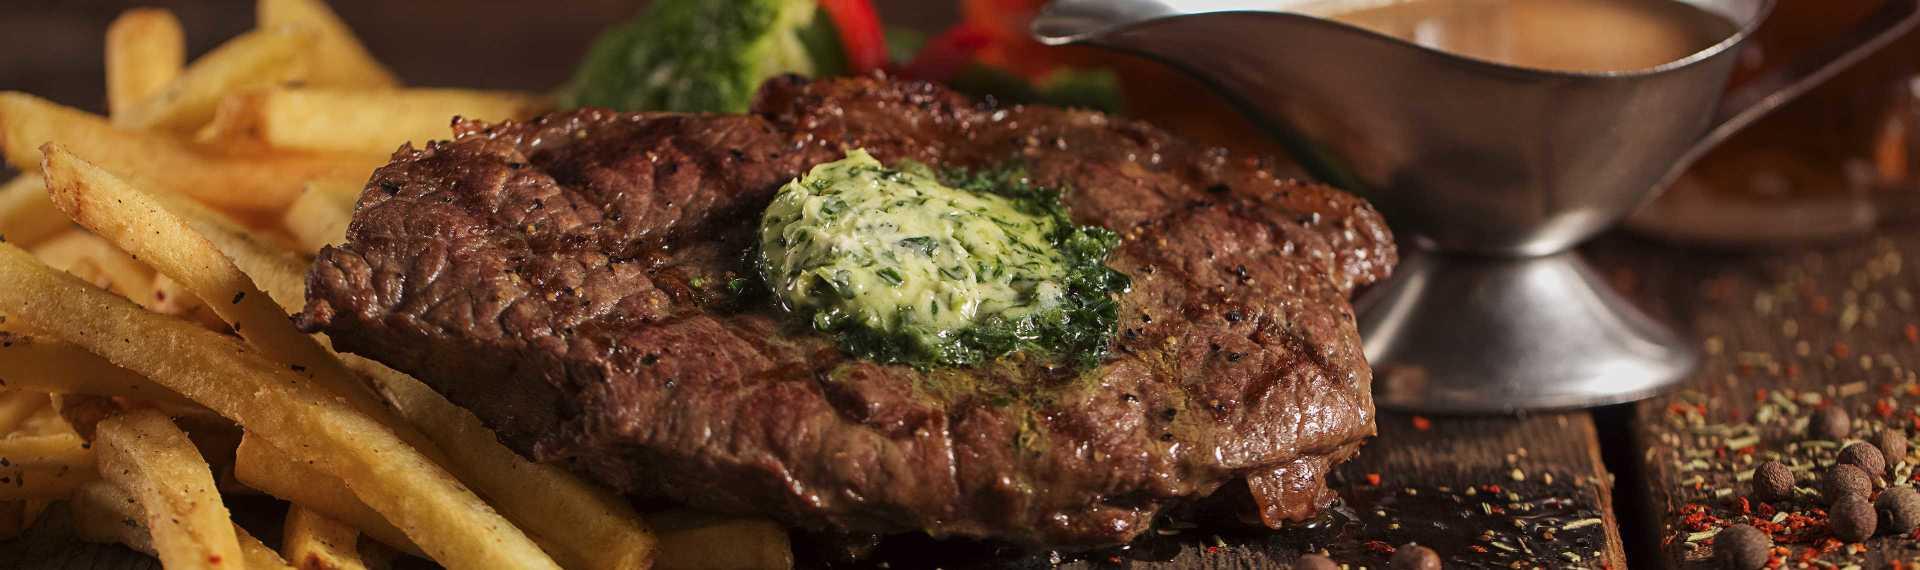 steak essen bei eurem junggesellenabschied. Black Bedroom Furniture Sets. Home Design Ideas